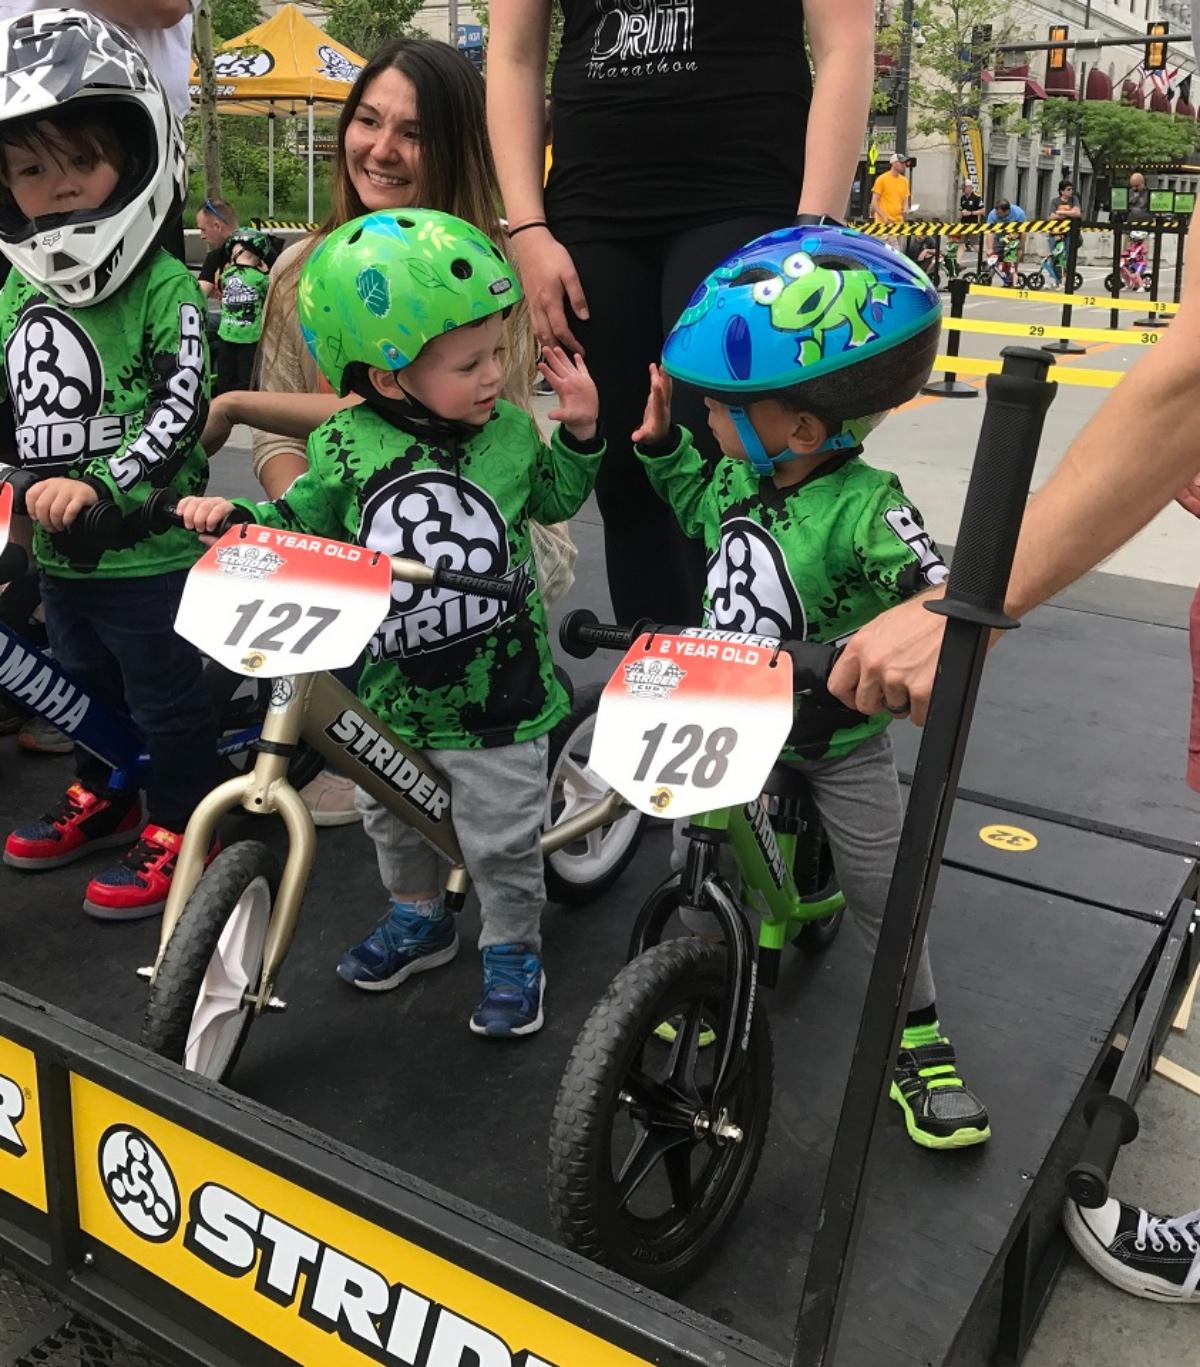 Toddler Tour de France hosting hundreds of little rippers